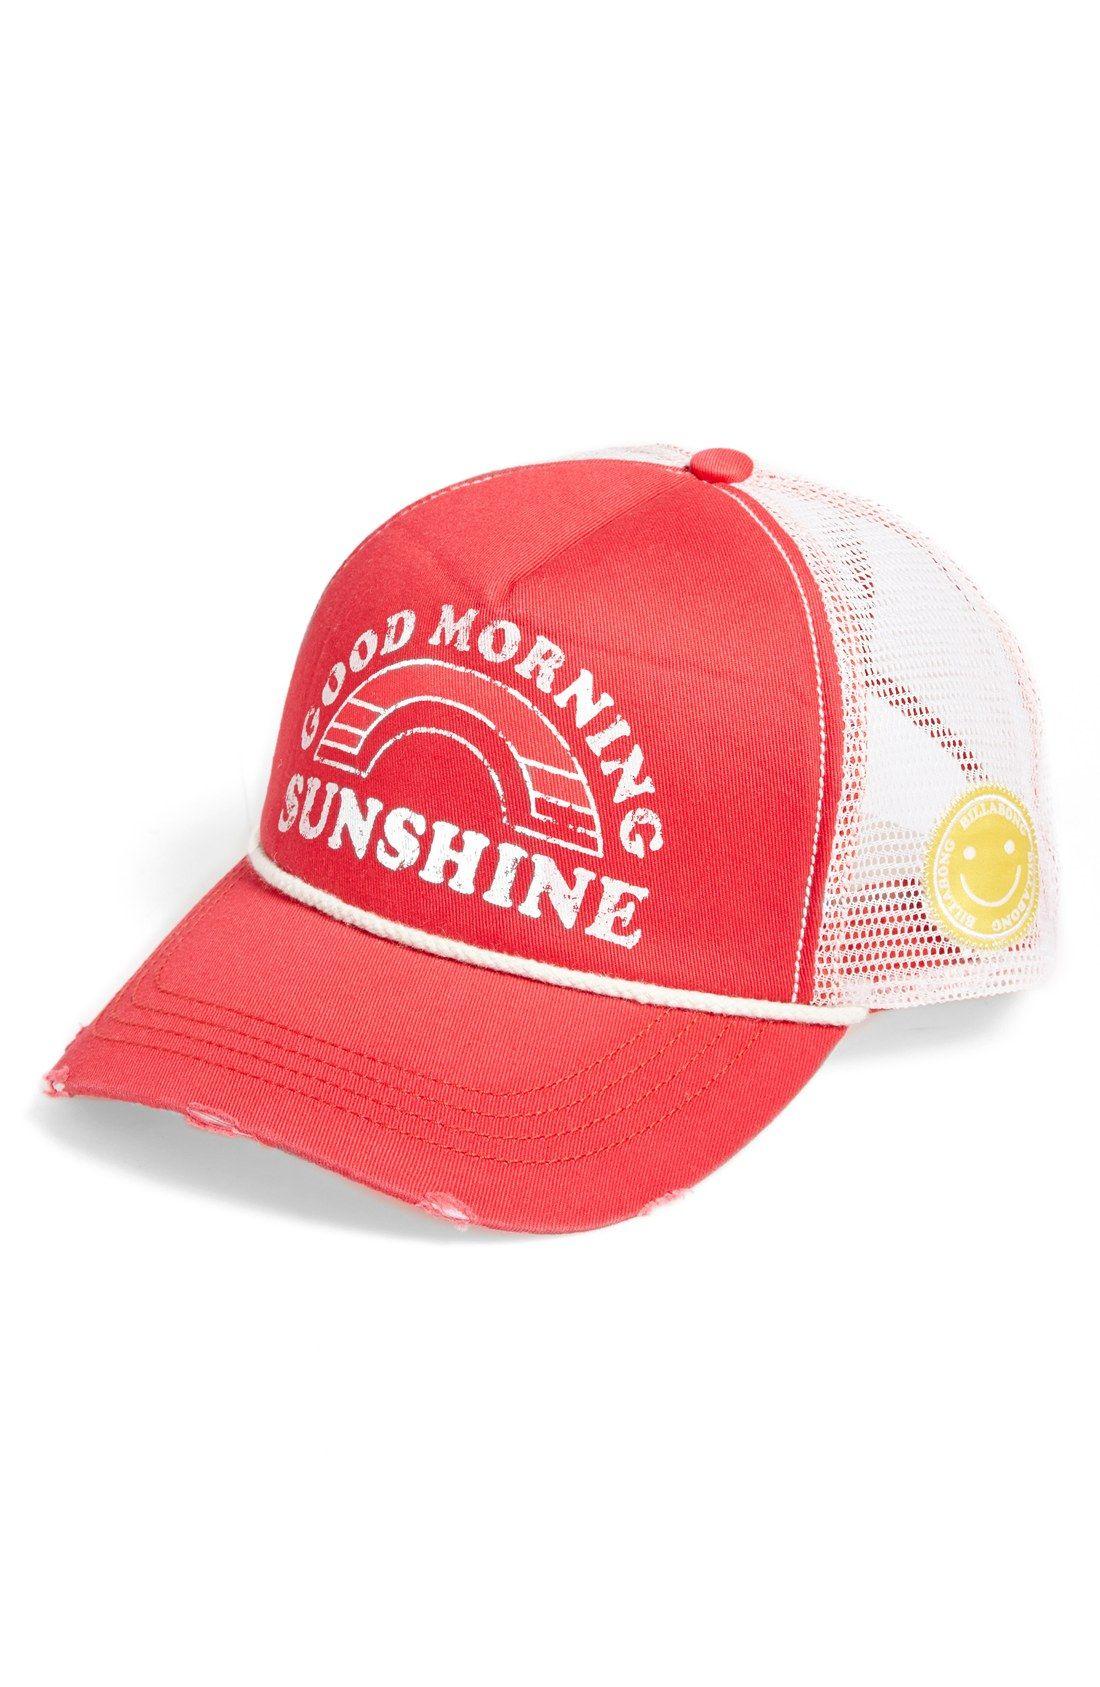 Billabong  Good Morning Sunshine  Trucker Hat  292c753c56c7